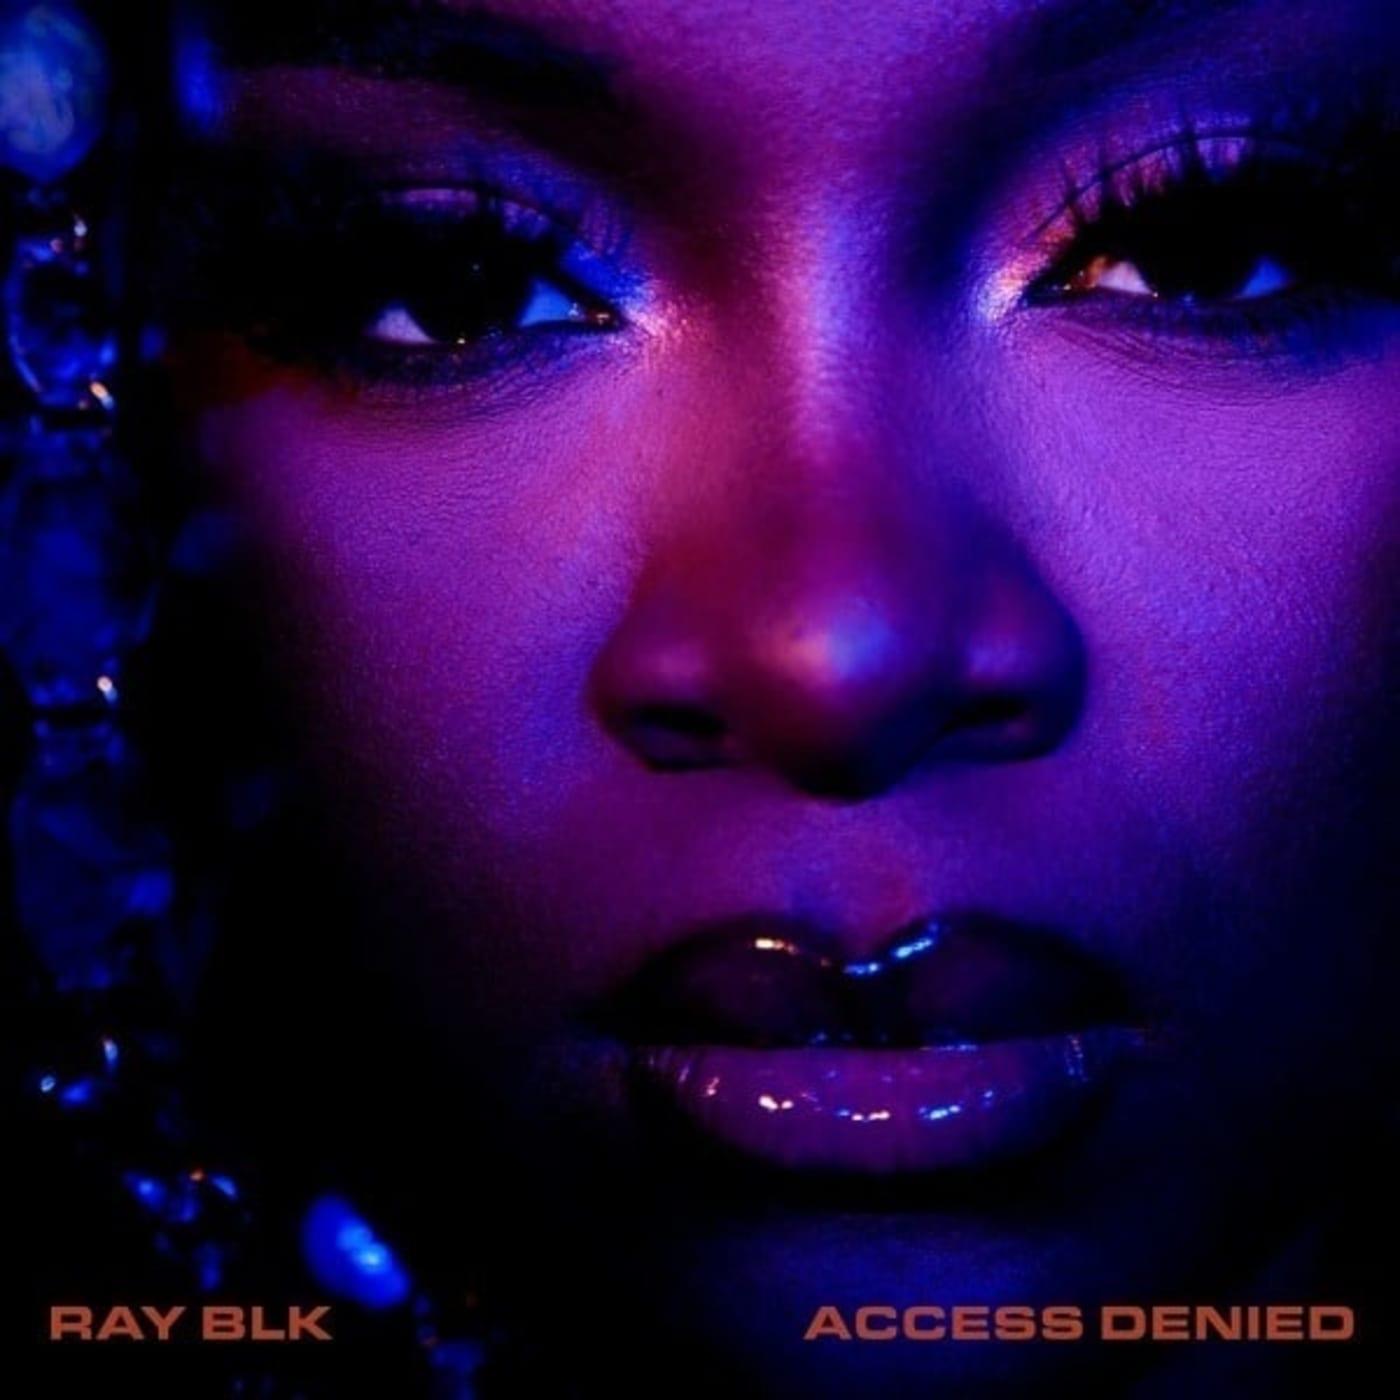 Access Denied (credit: Universal Music)